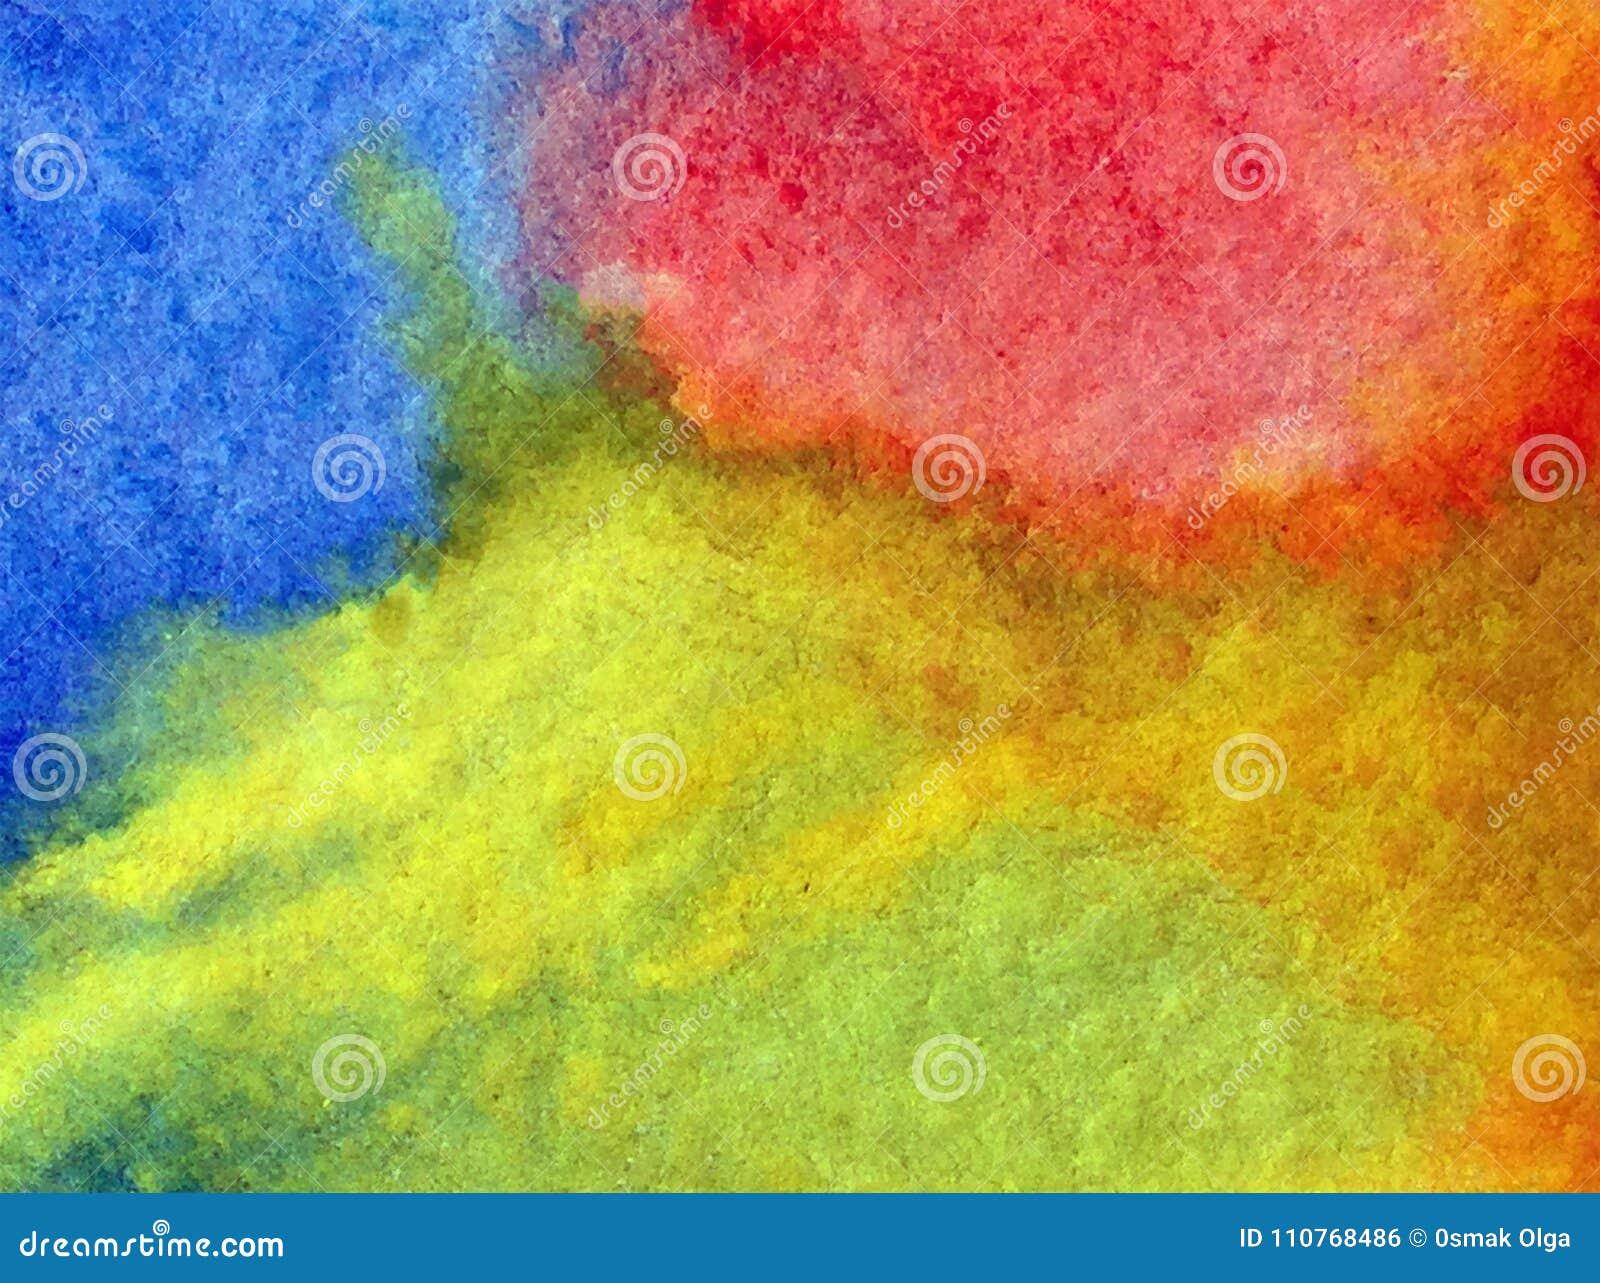 Watercolor art abstract background fresh sky sun shine beautiful modern textured wet wash blurred fantasy